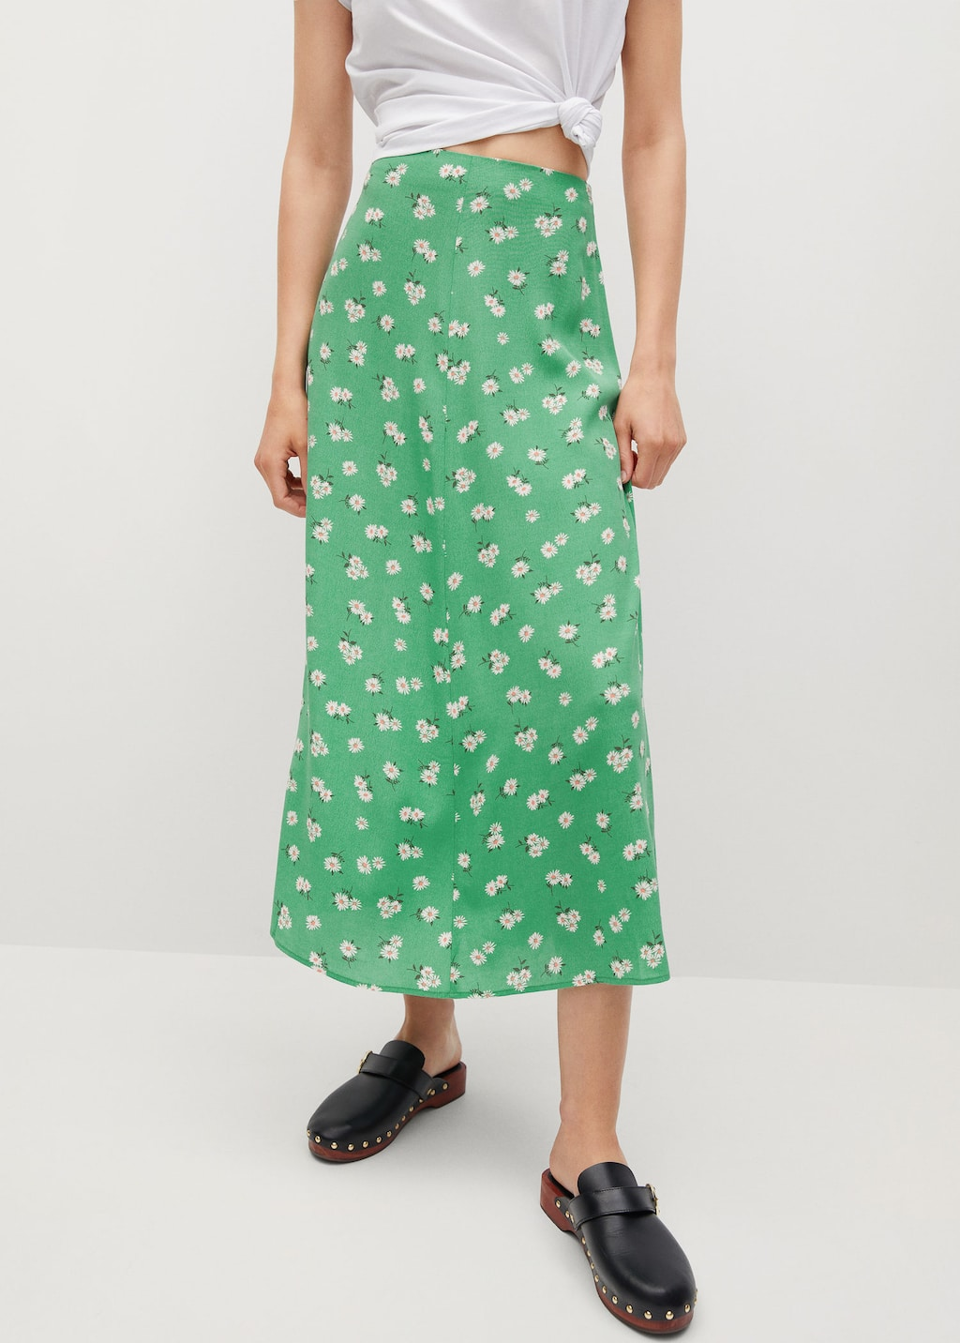 Printed midi skirt   Woman   Mango Estonia